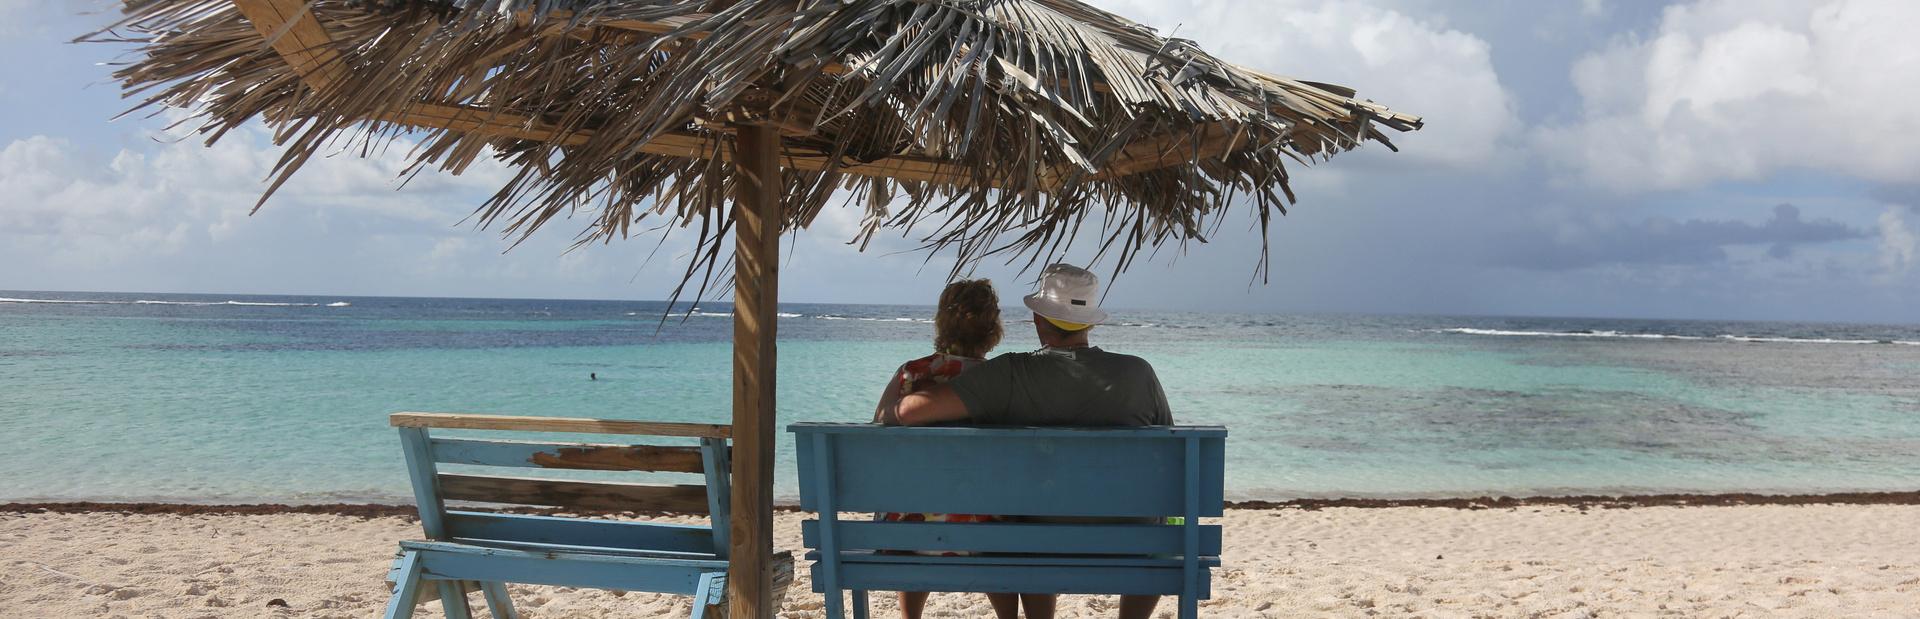 Anegada Island news photo